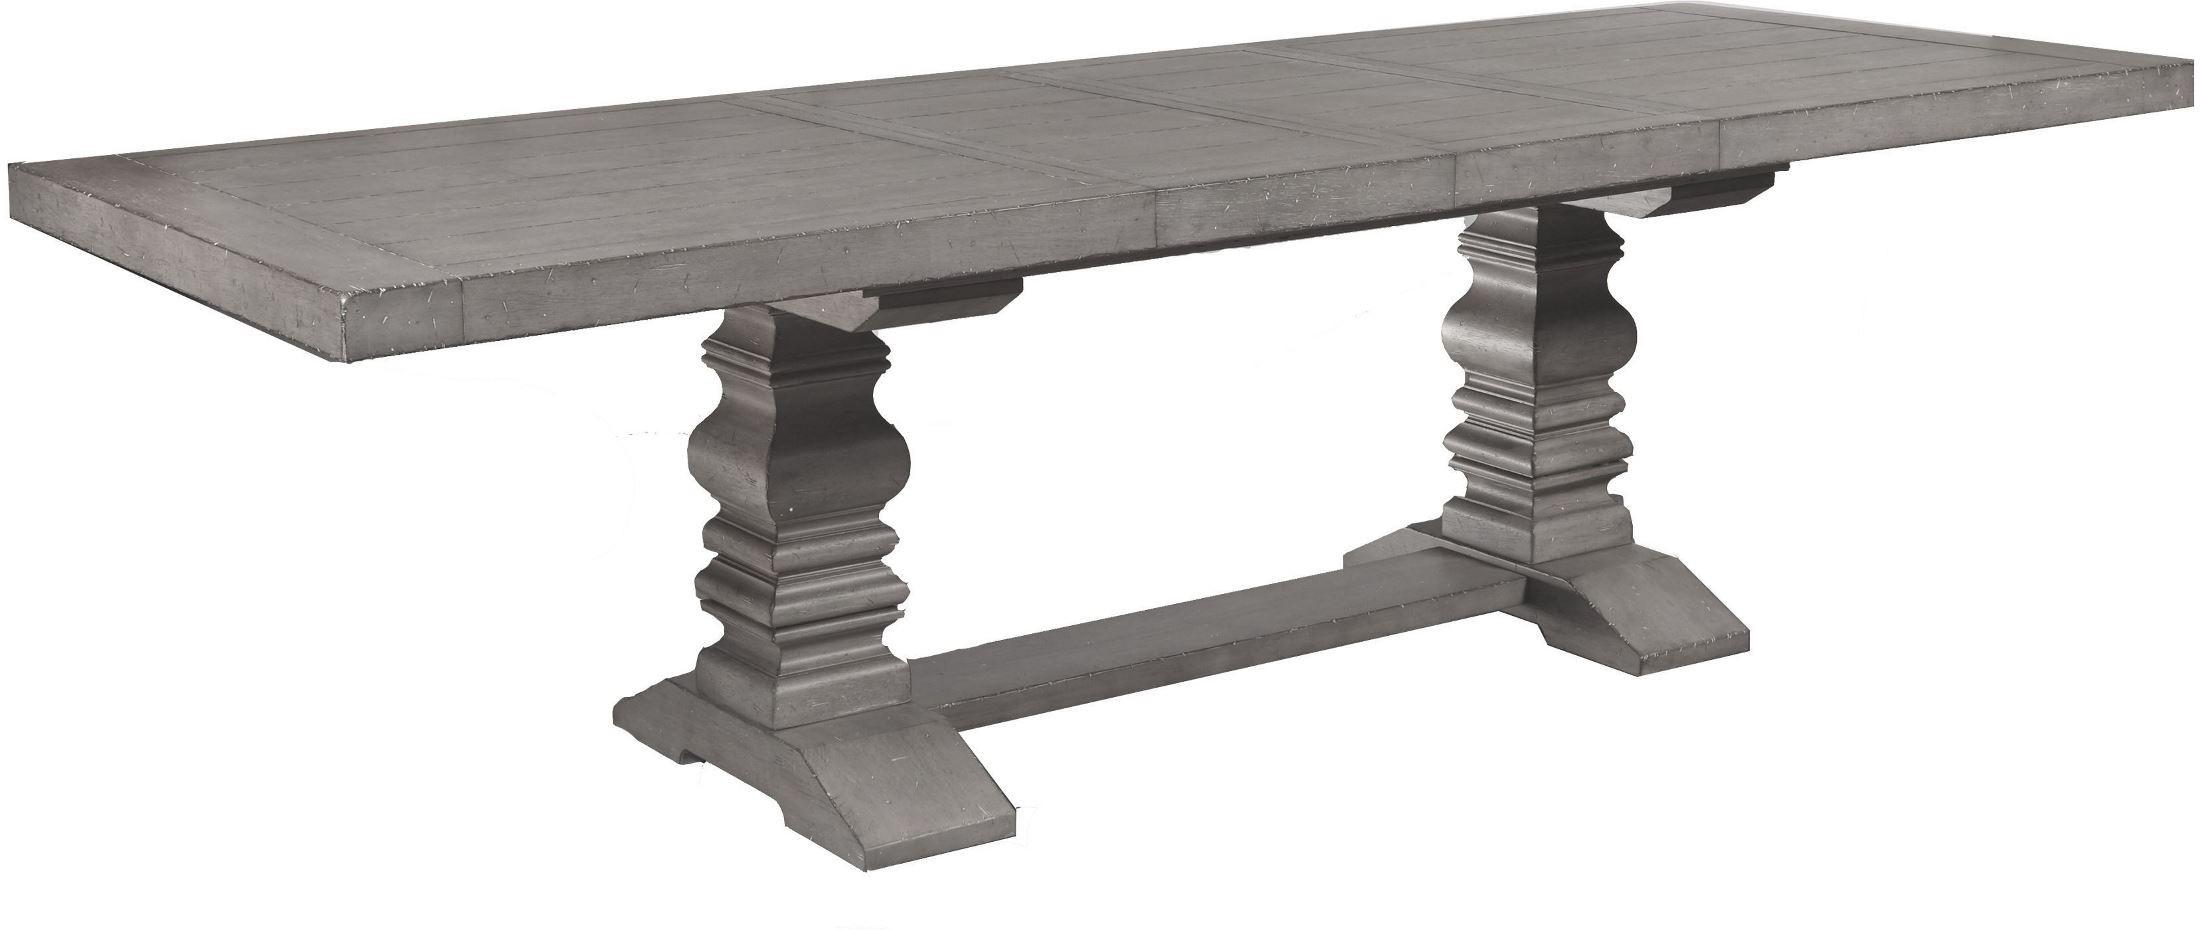 Prospect Hill Gray Rectangular Extendable Pedestal Dining  : s082 131a131bs5 from colemanfurniture.com size 2200 x 930 jpeg 151kB